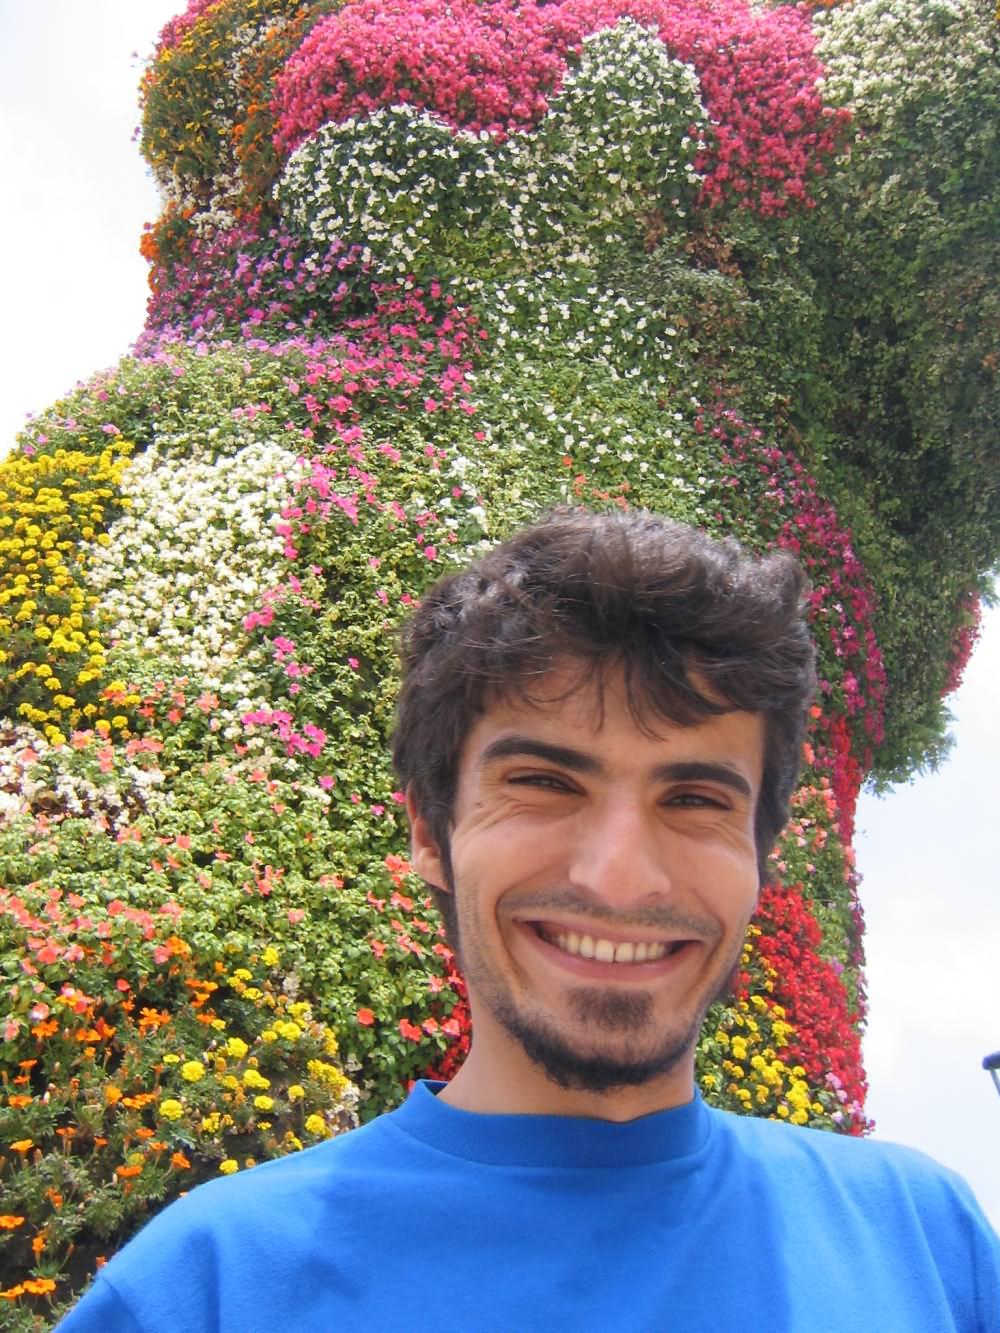 Flowered Dog Guggenheim